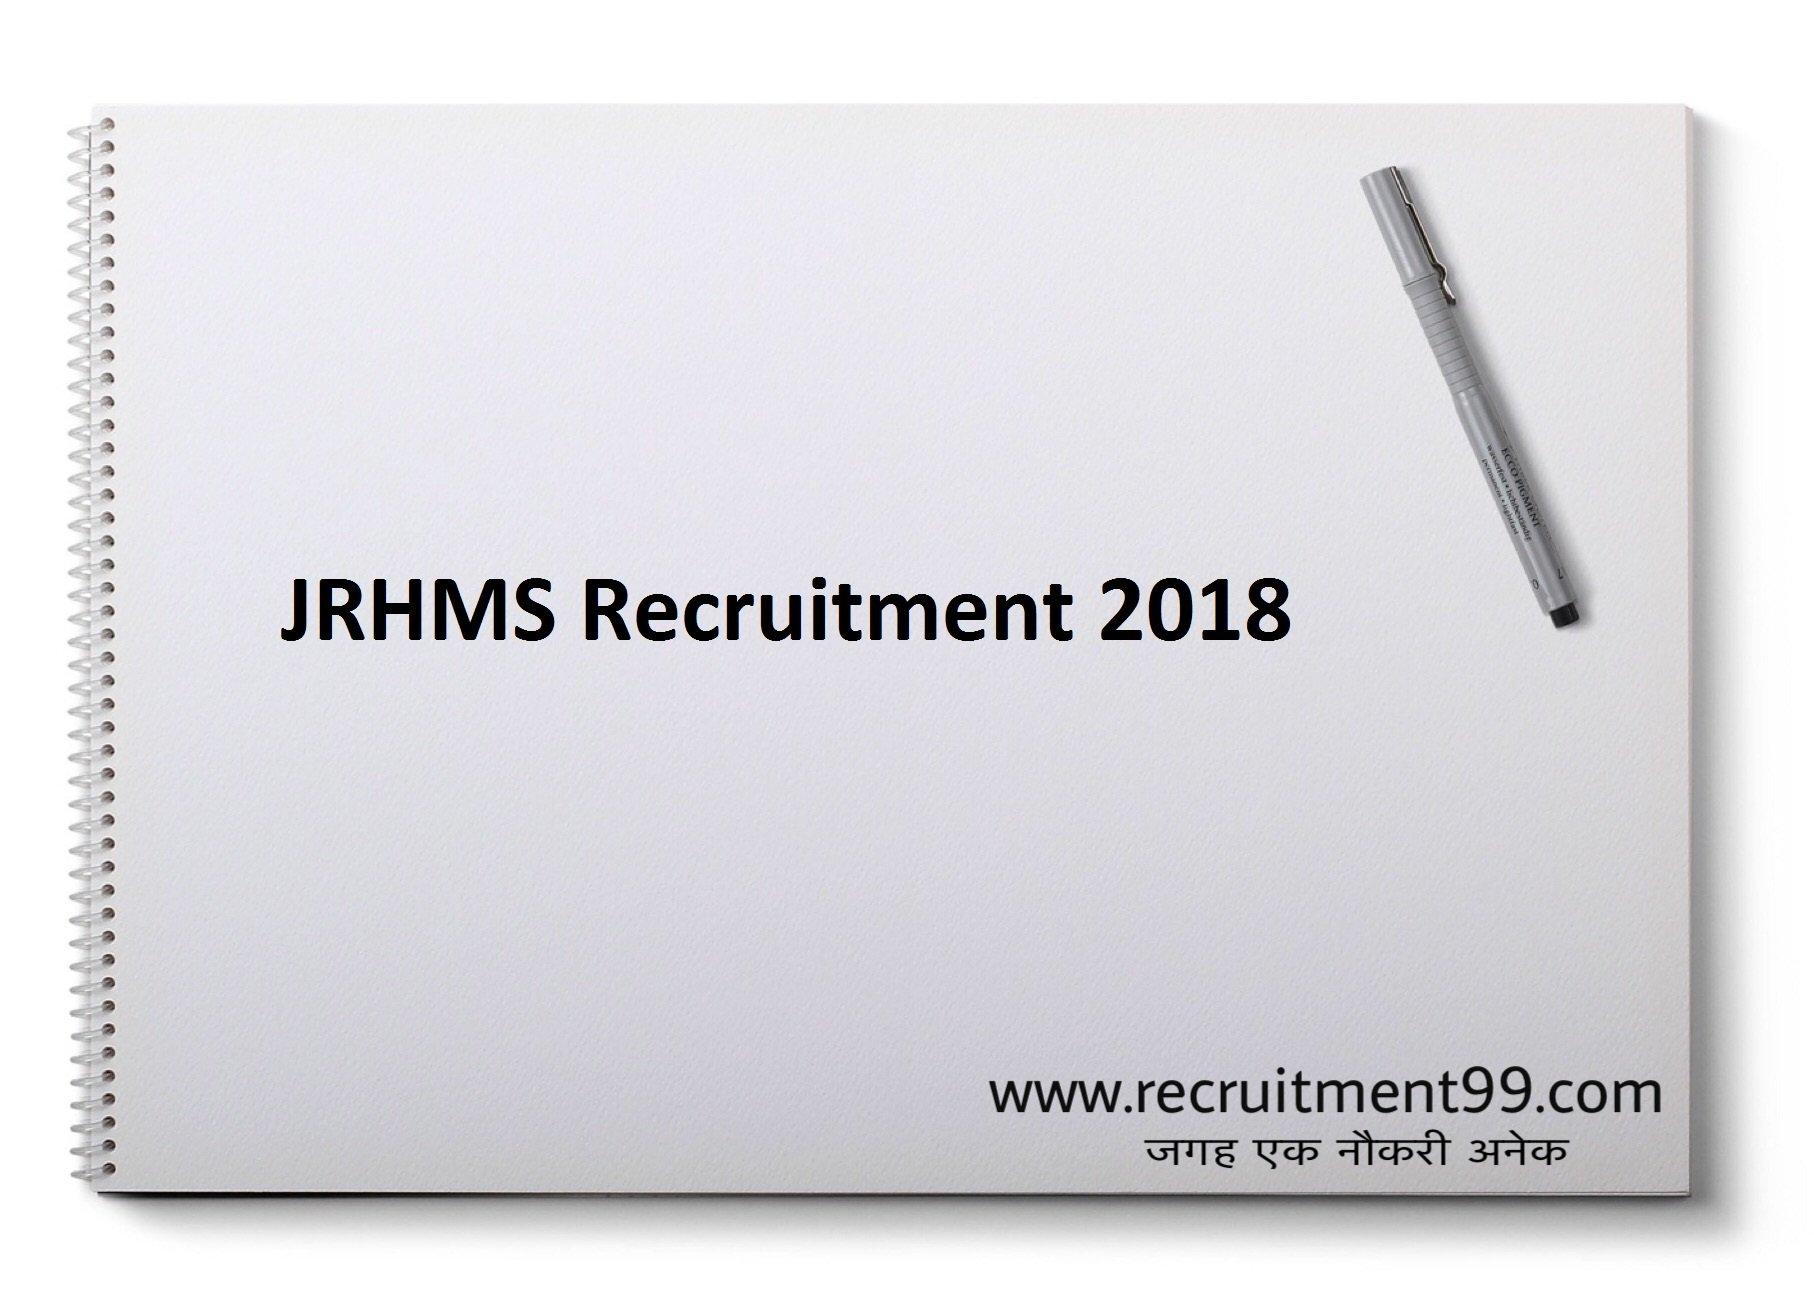 JRHMS Community Health Officer (CHO) Recruitment Admit Card Result 2018